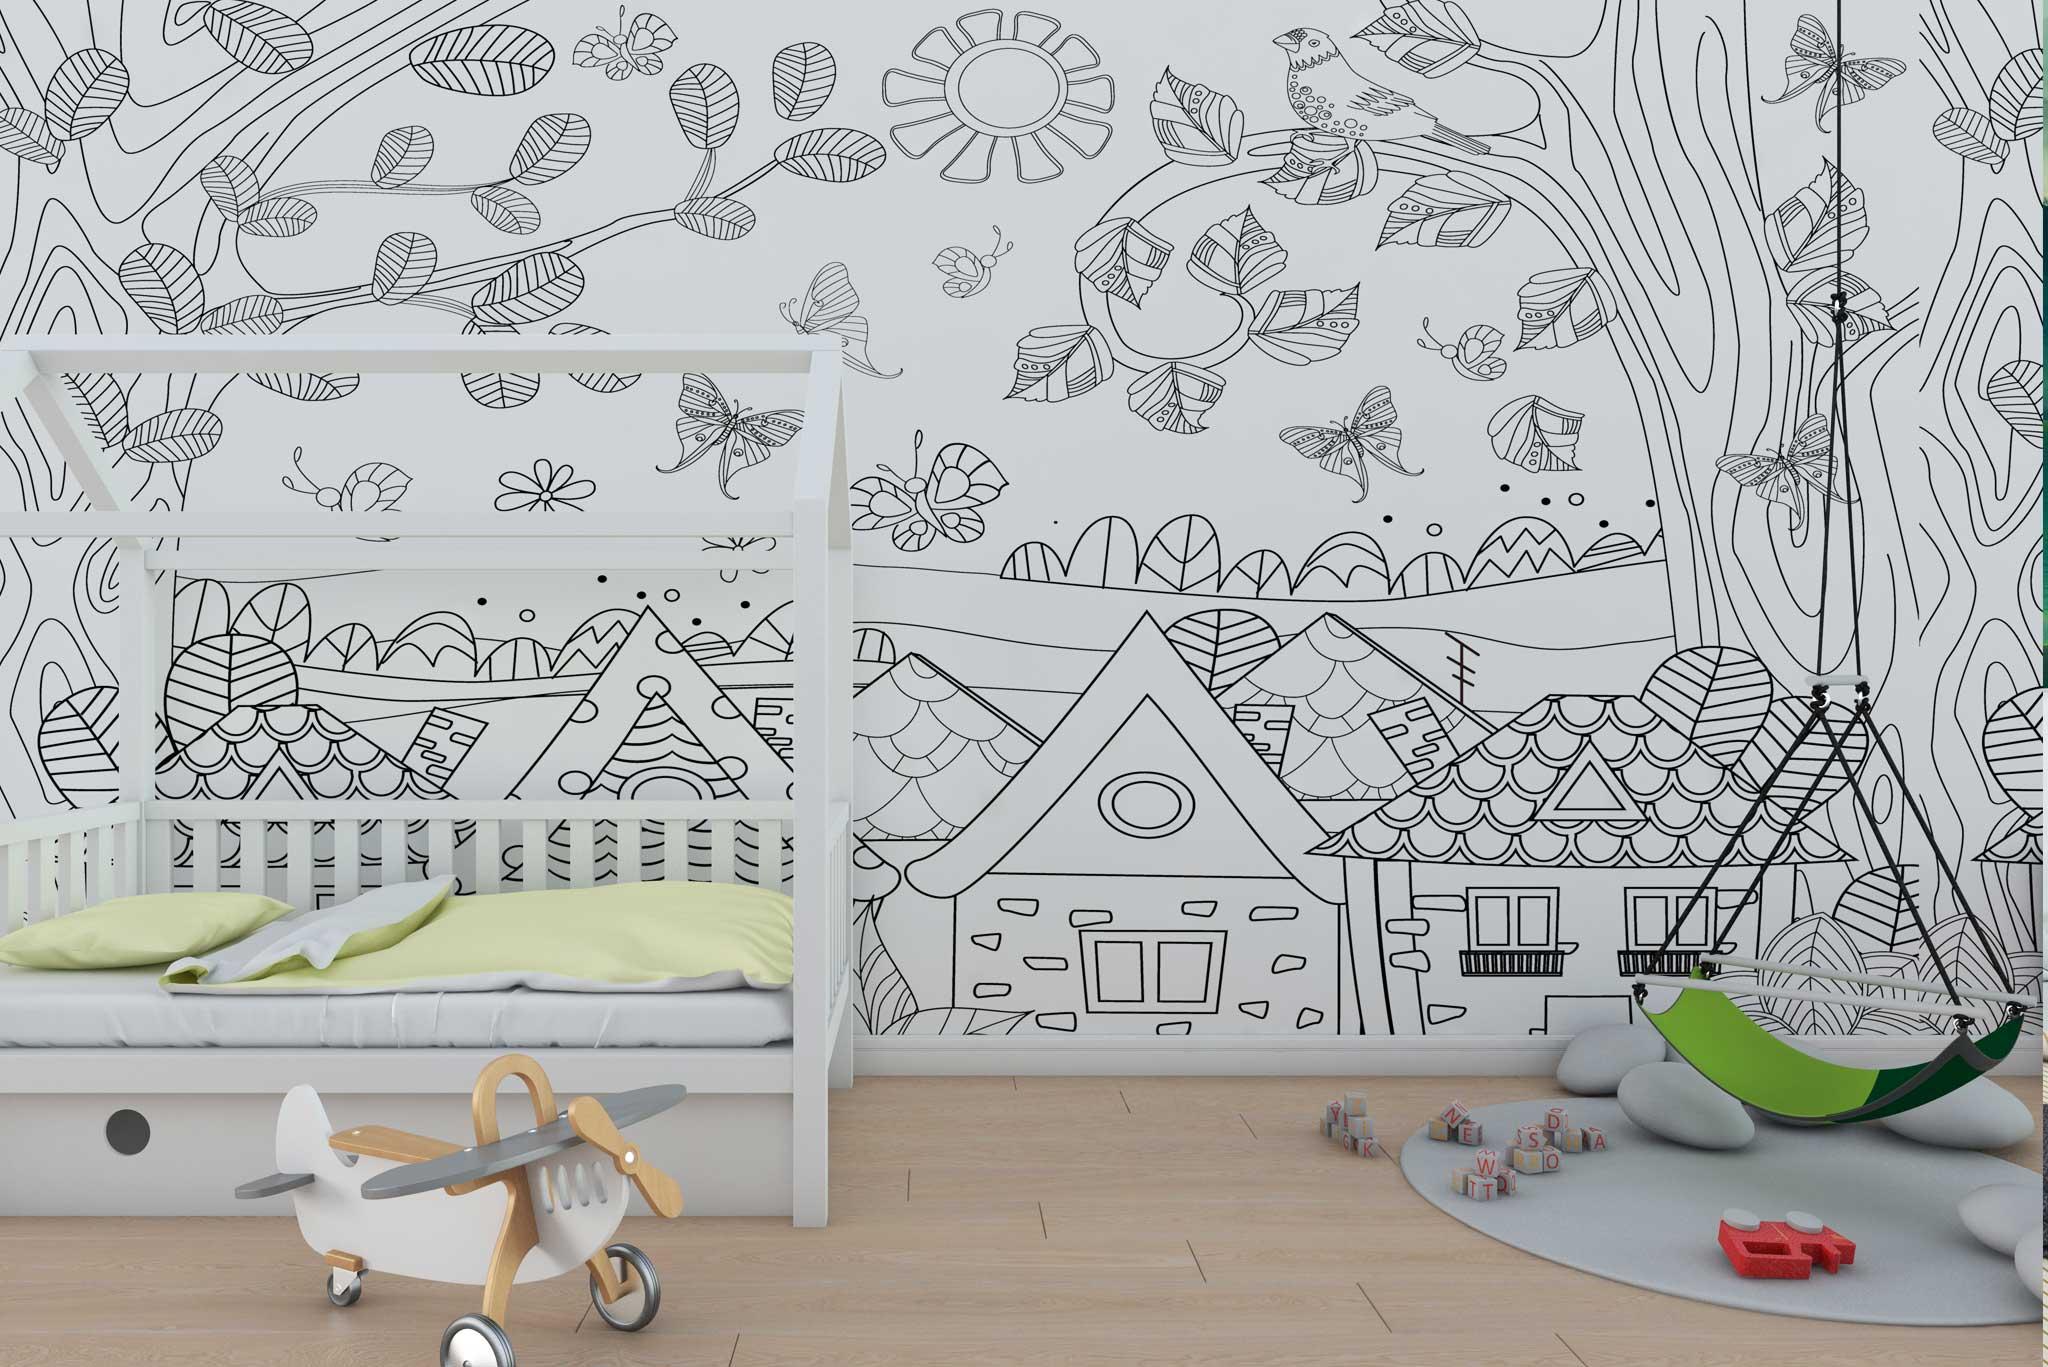 tapet-fototapet-design-personalizat-customizabil-comanda-special-camera-dormitor-copii-model-de-colorat=casute-copaci-alb-negru